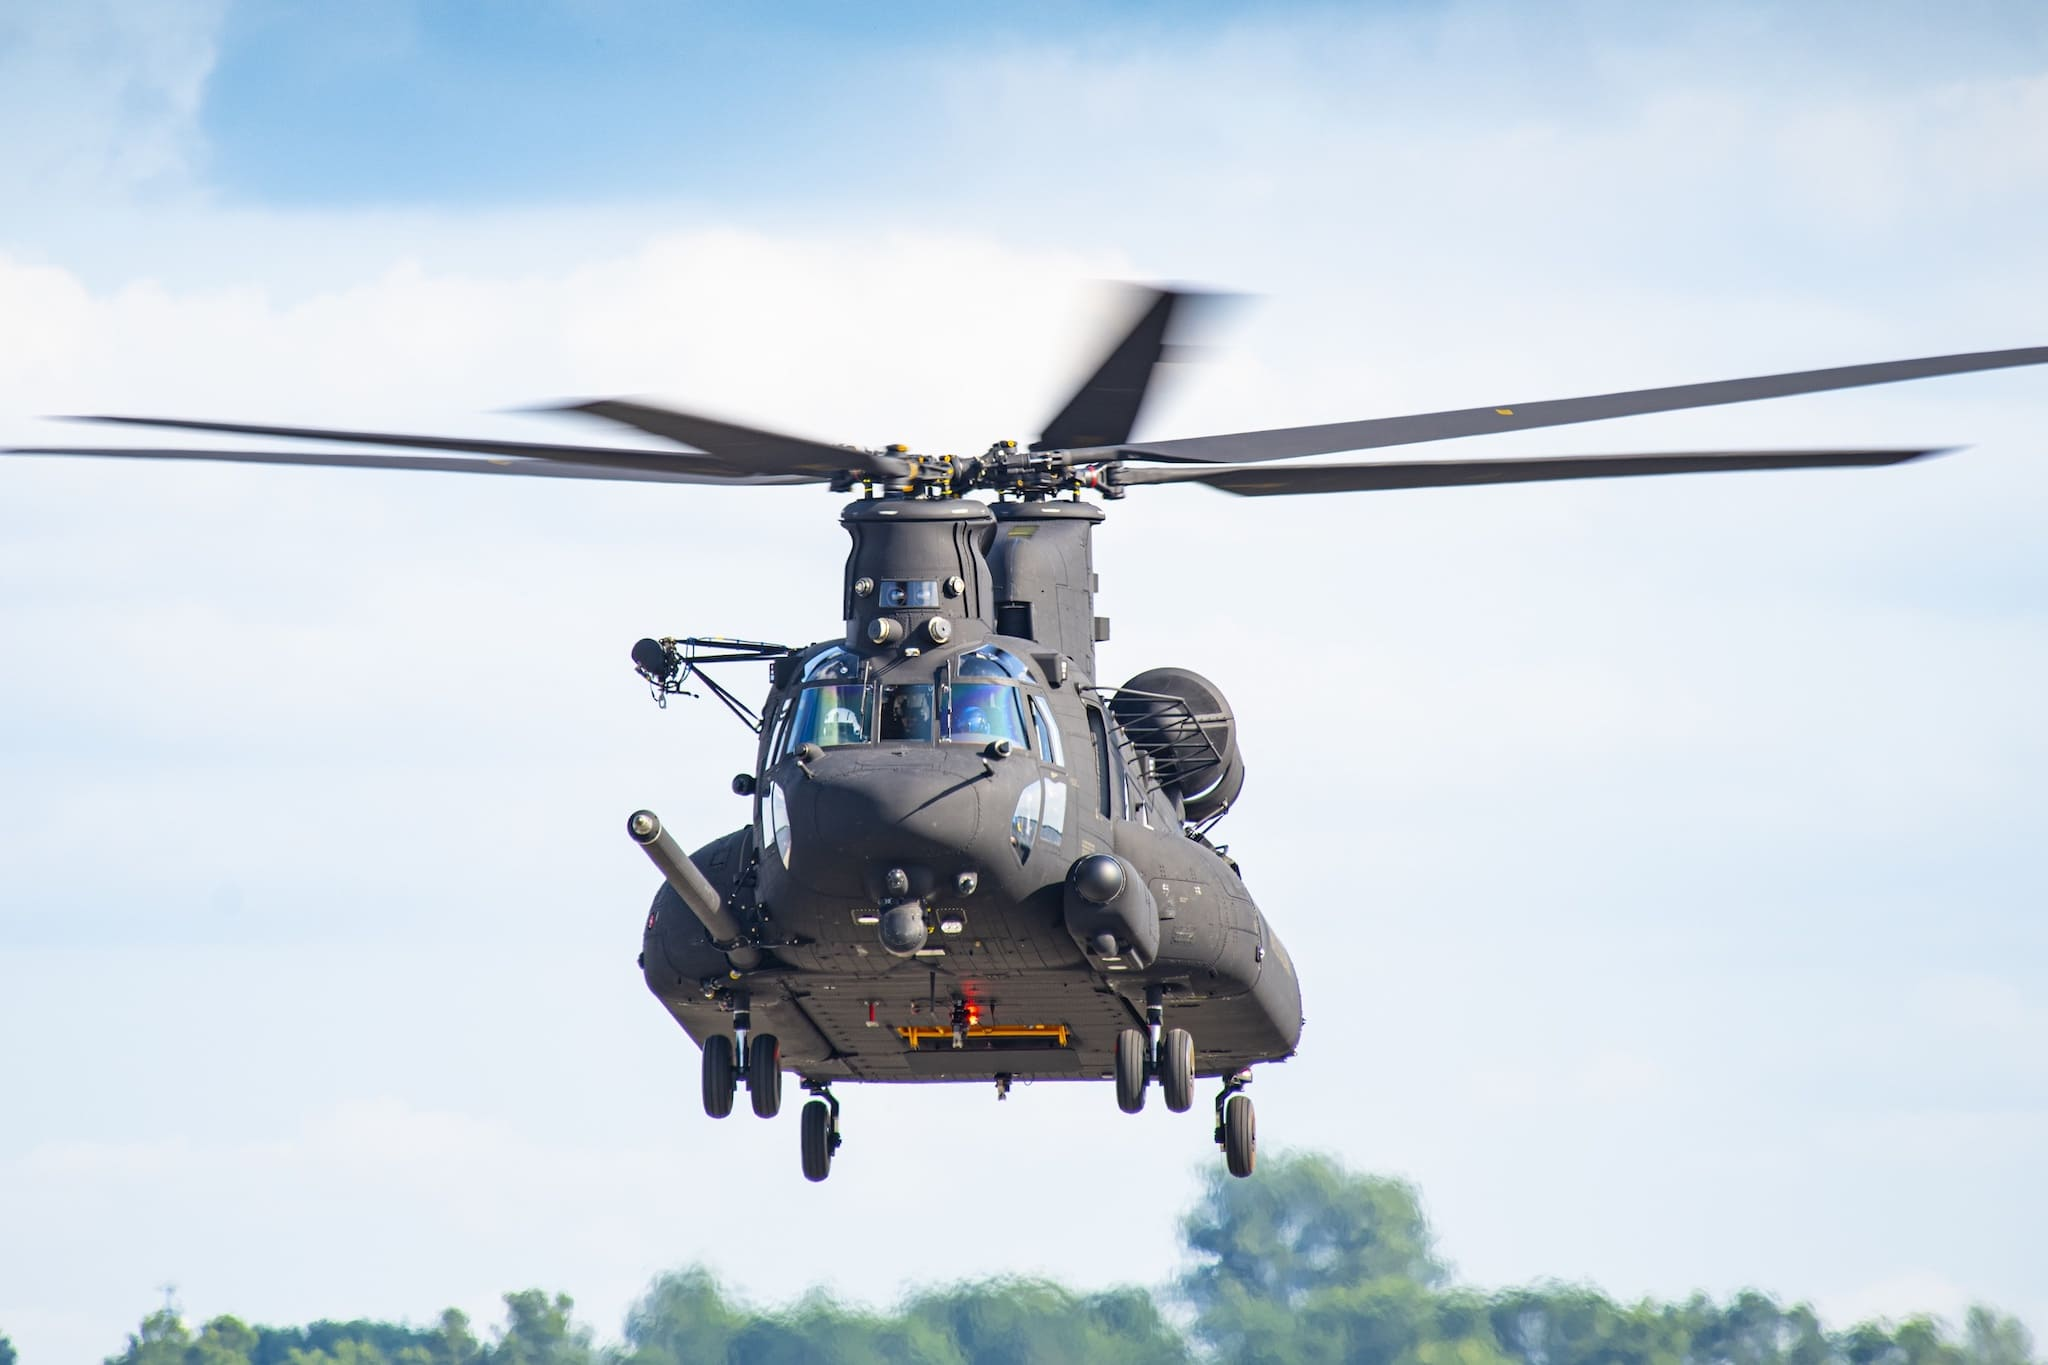 Boeing Chinook NG MH-47G Block II